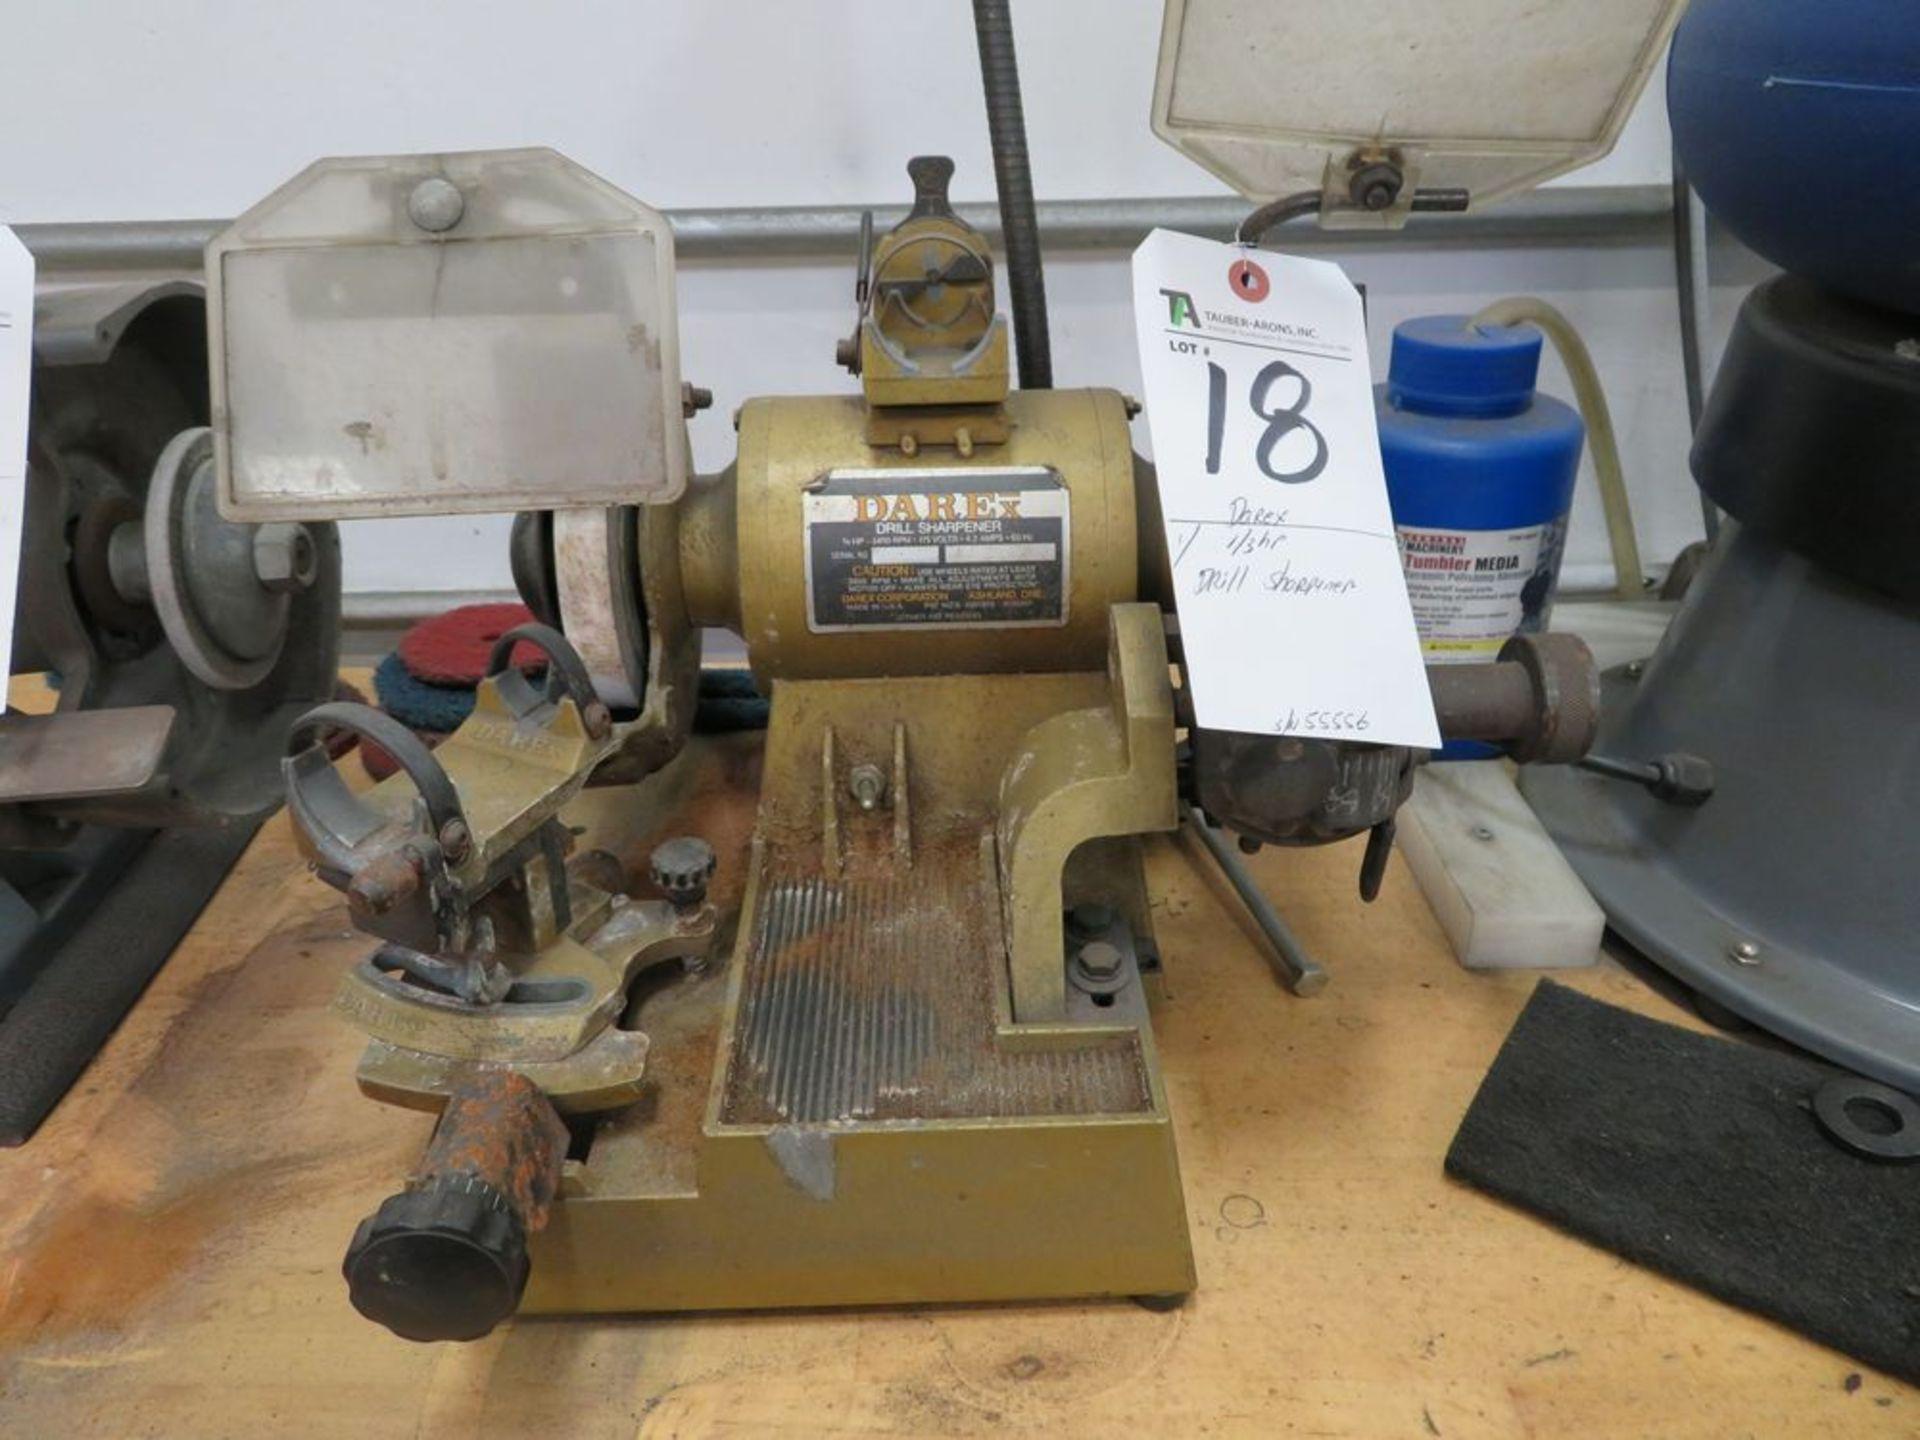 Lot 18 - Darex 1/3hp Drill Sharpener S/N 55556